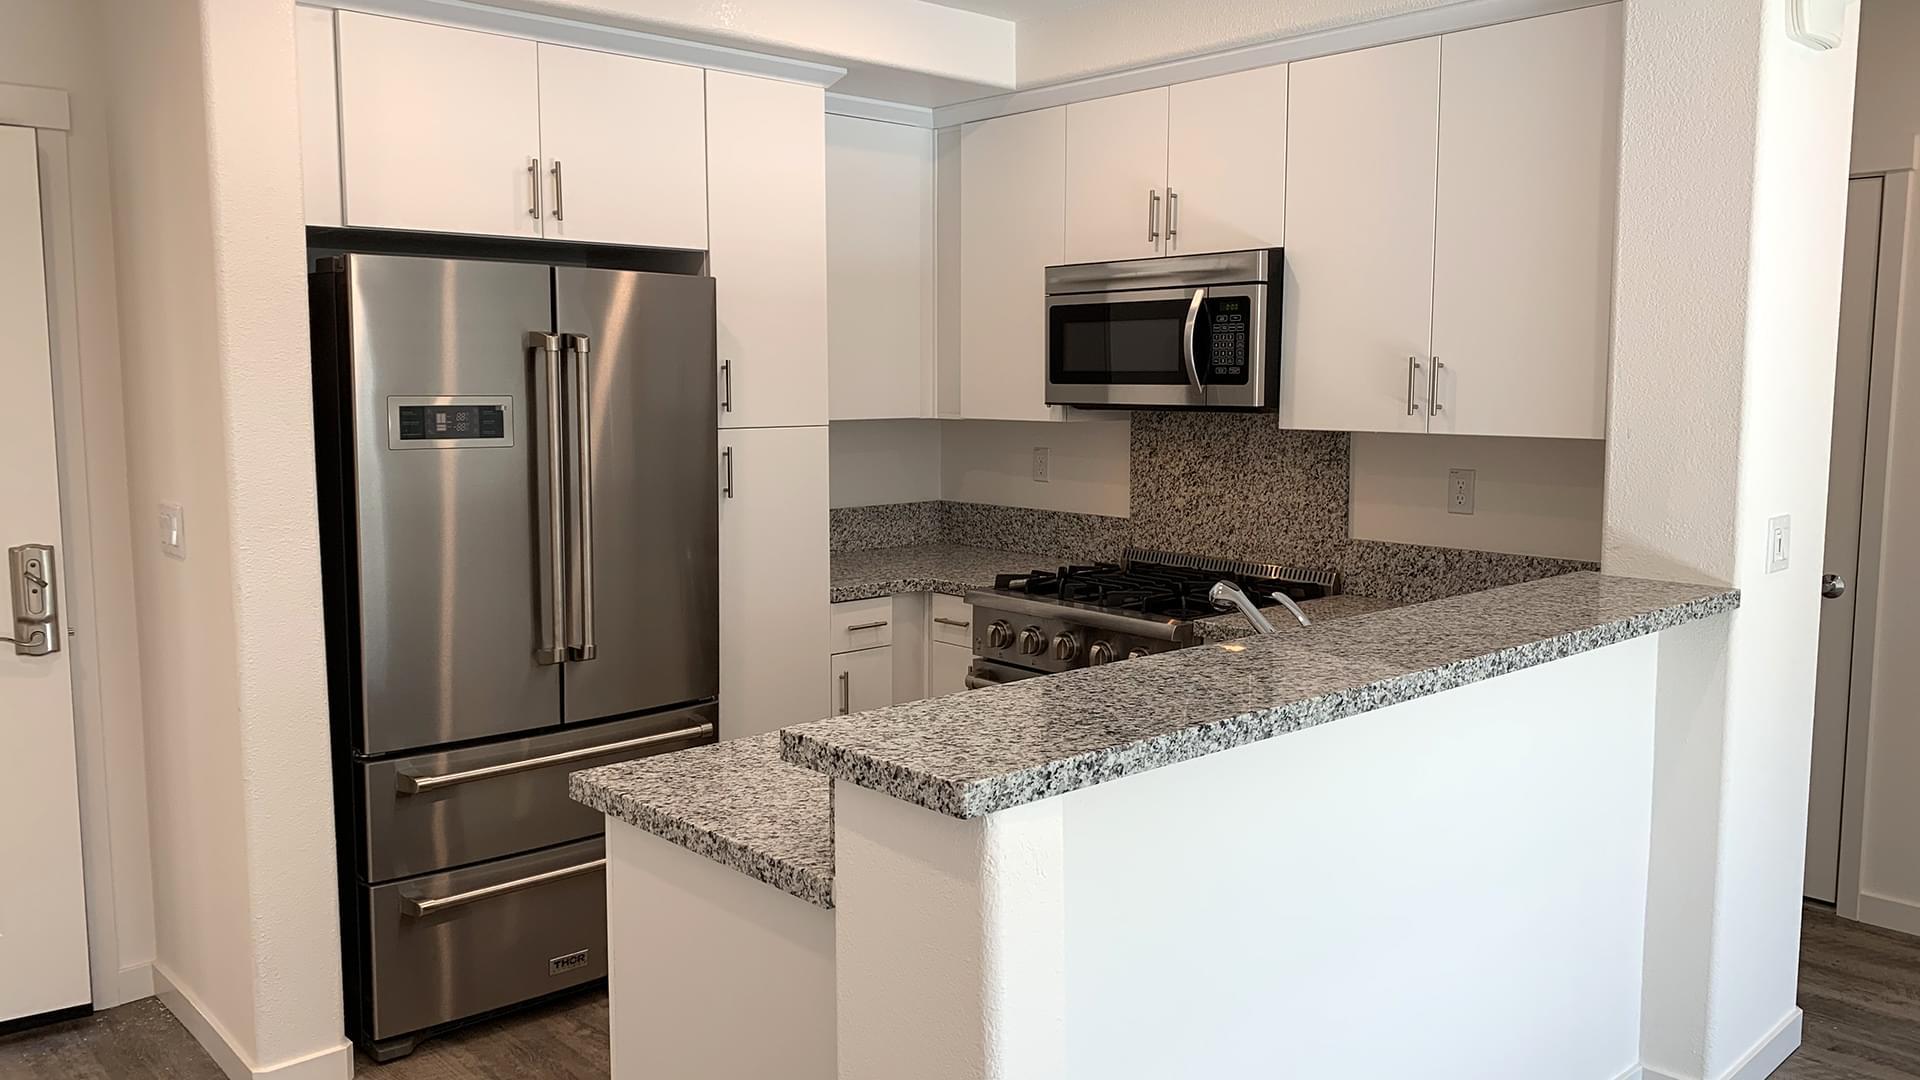 Unit 3302 Kitchen